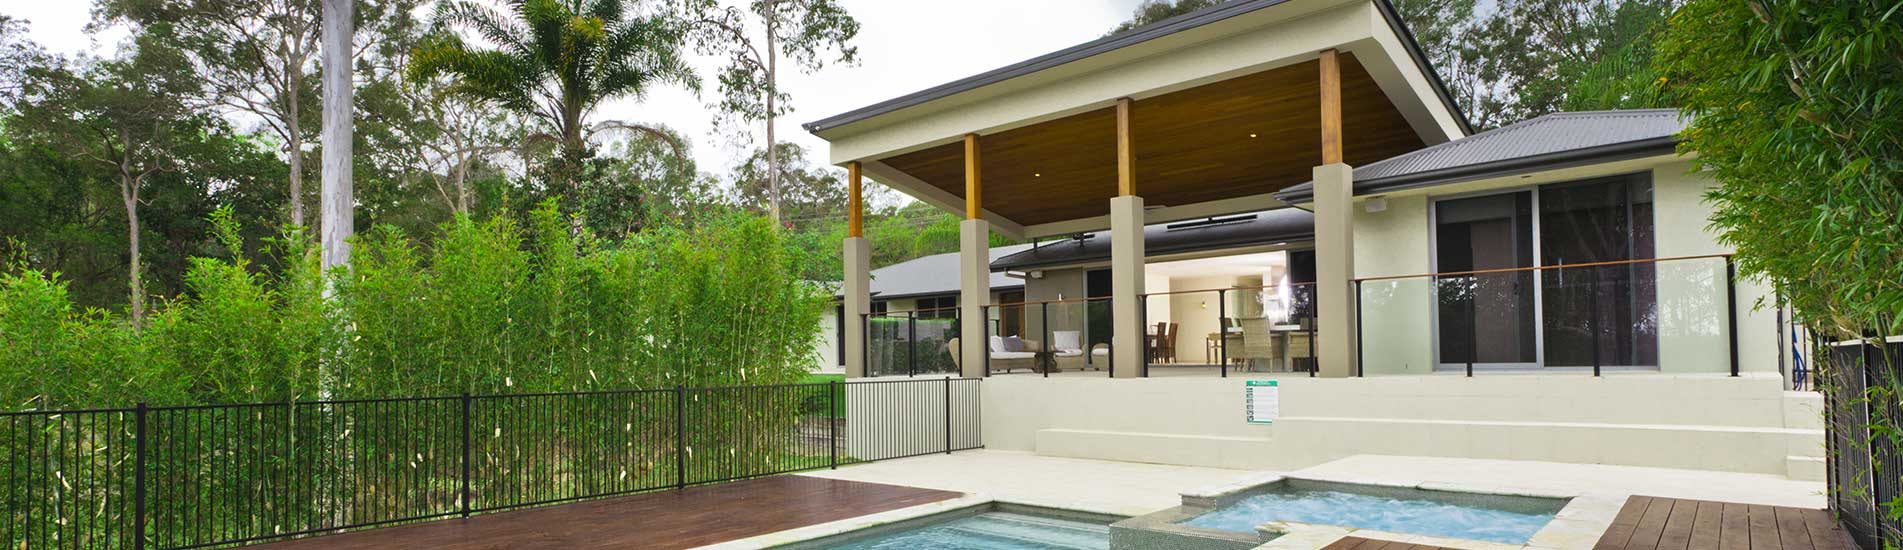 managed-property-backyard